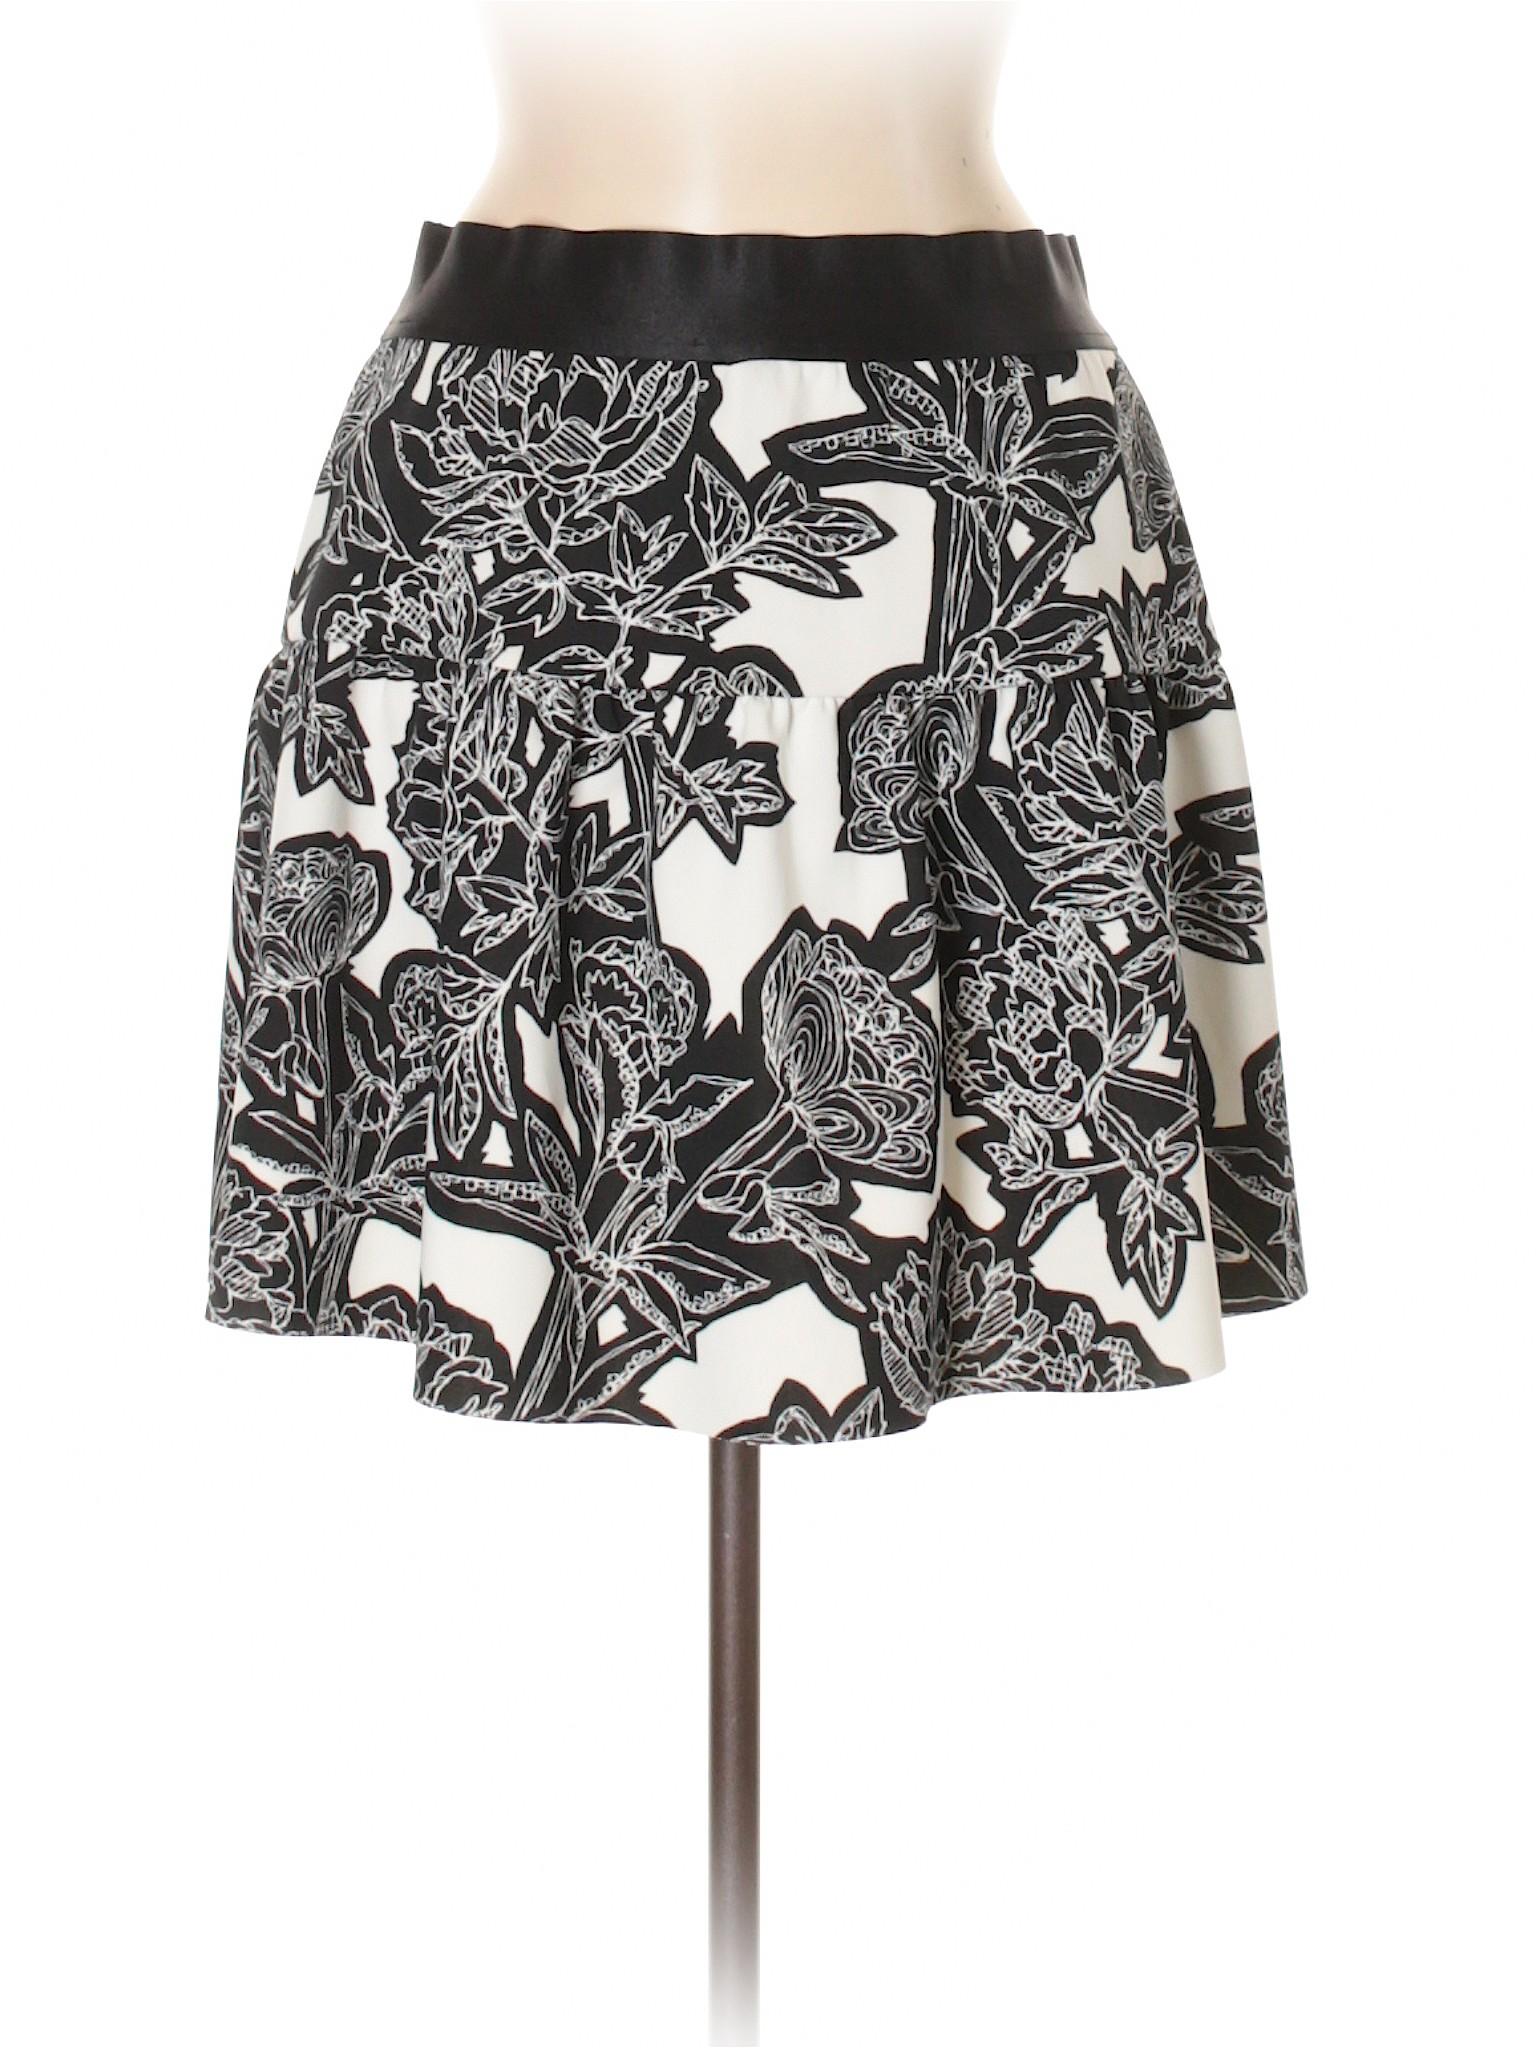 Boutique Casual Skirt Boutique Skirt Casual Skirt Boutique Boutique Casual 61CvwAq